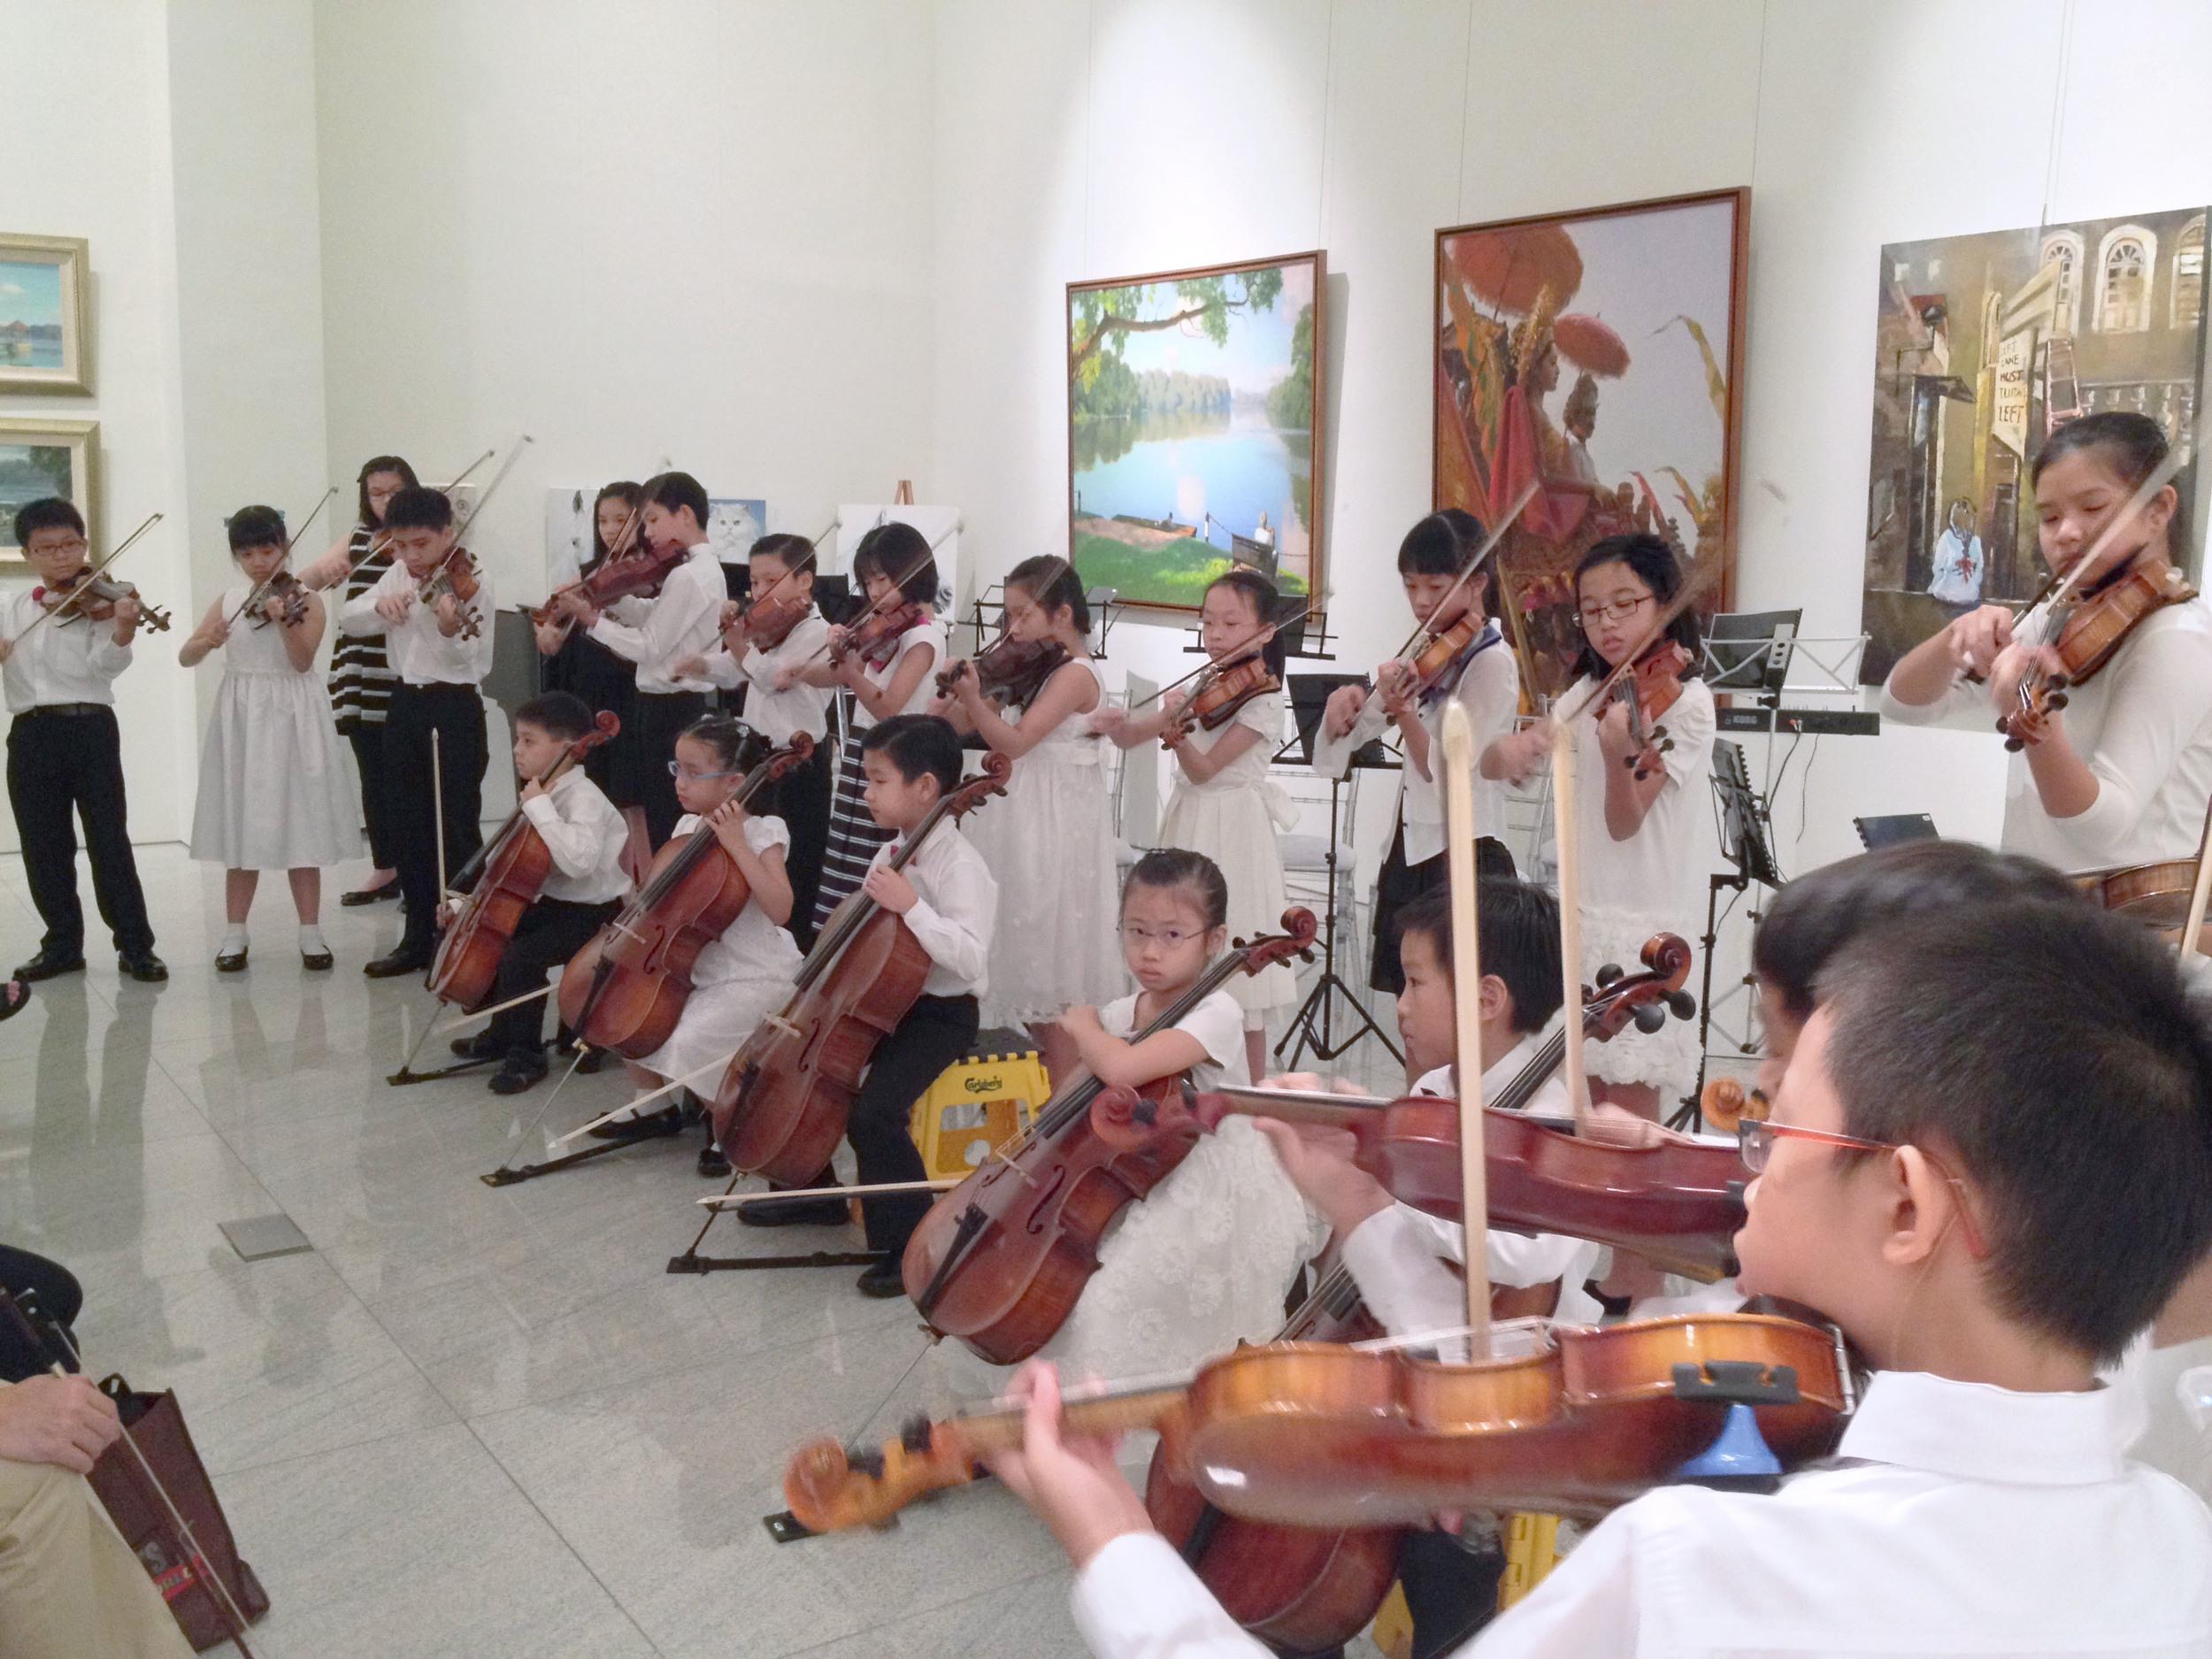 Performance by Joyful Strings